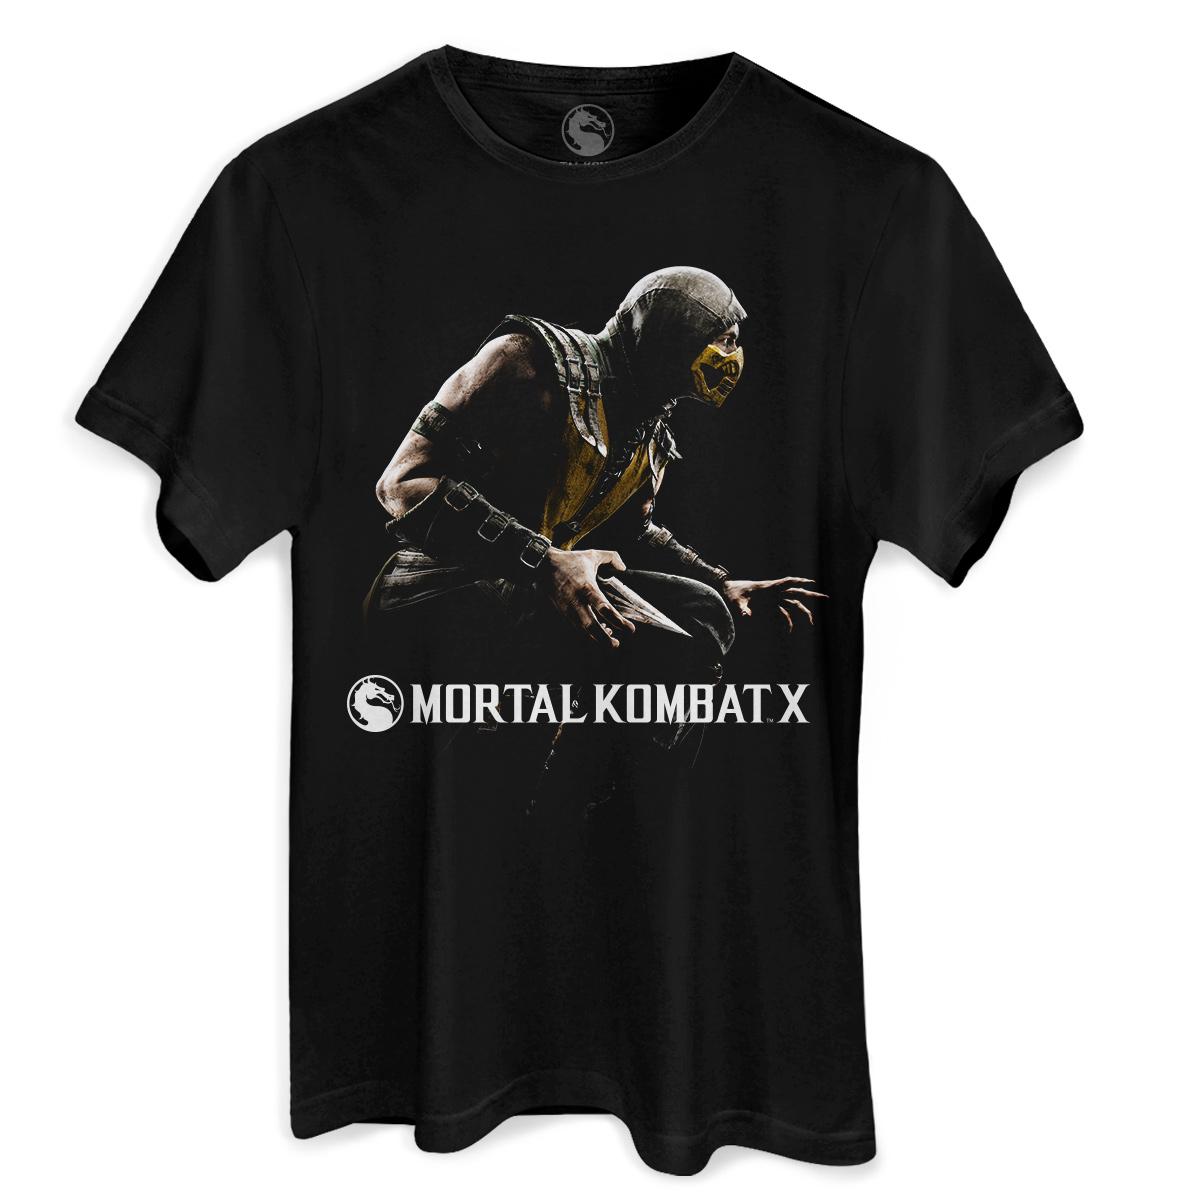 Camiseta Masculina Mortal Kombat X Capa  - bandUP Store Marketplace